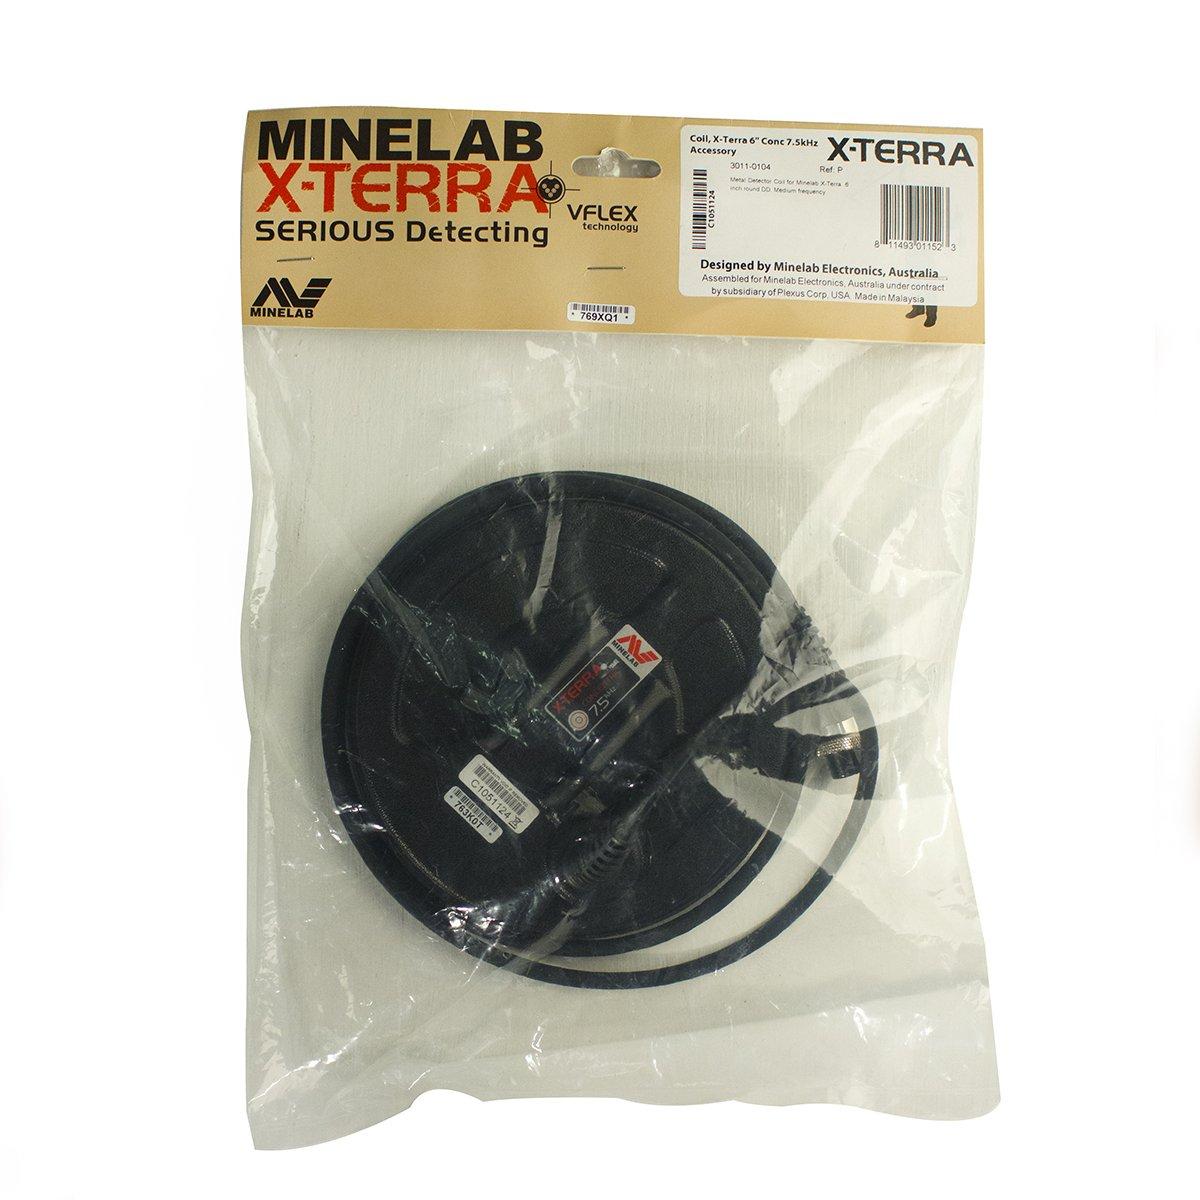 PLACA DE METAL DETECTOR CERCAMETALLI MINELAB X-TERRA 6 «DD 7, 5 kHz: Amazon.es: Jardín